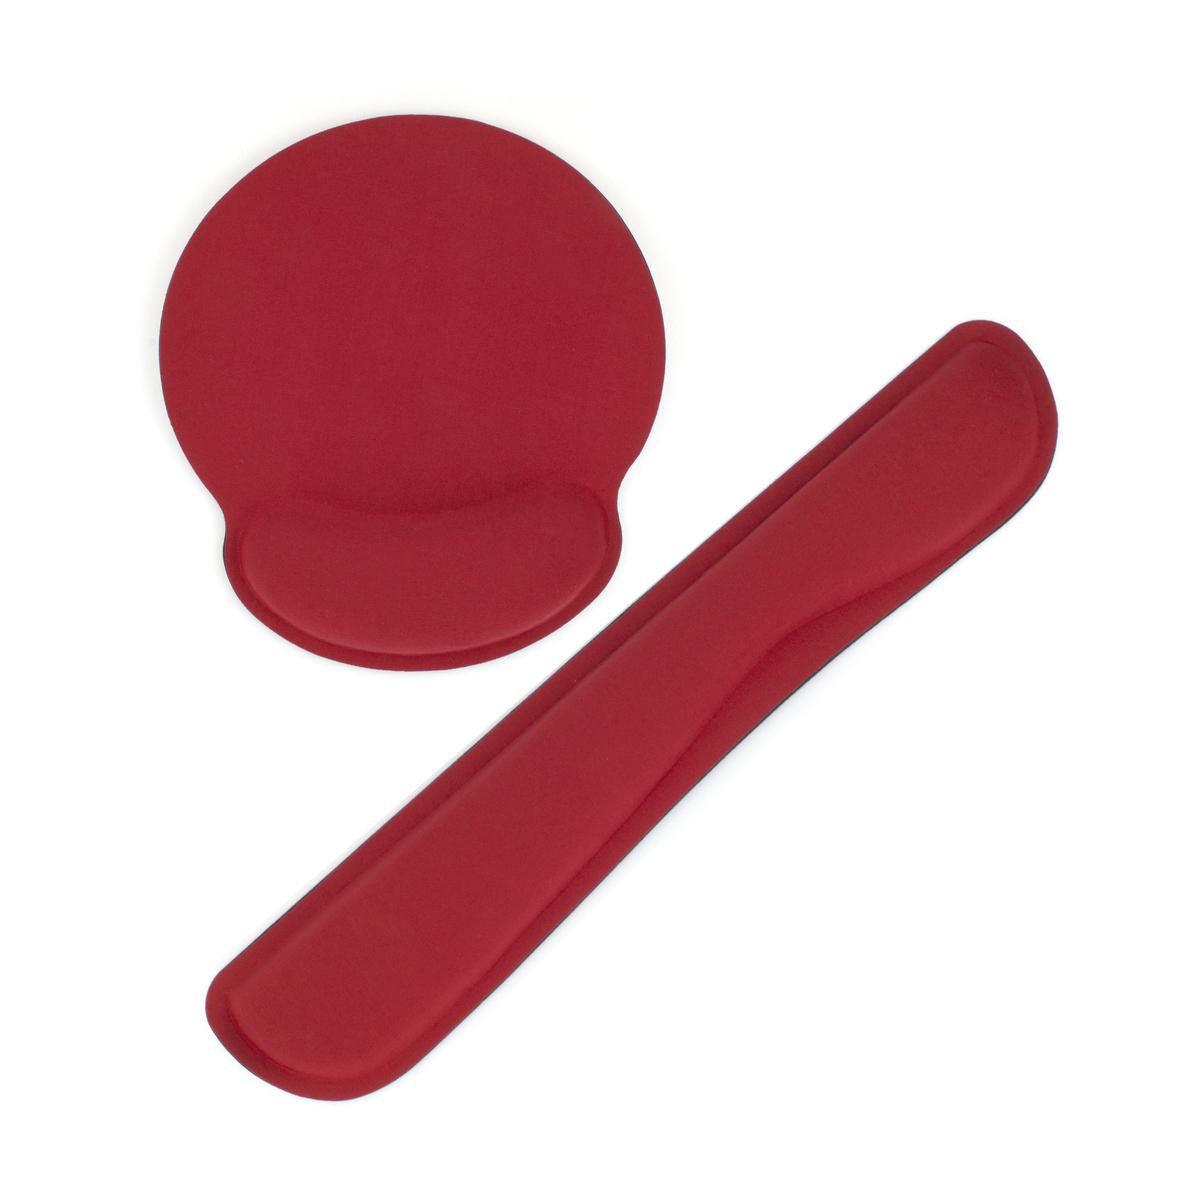 CONTOUR RED PLUSS RULLEMUS Power.no